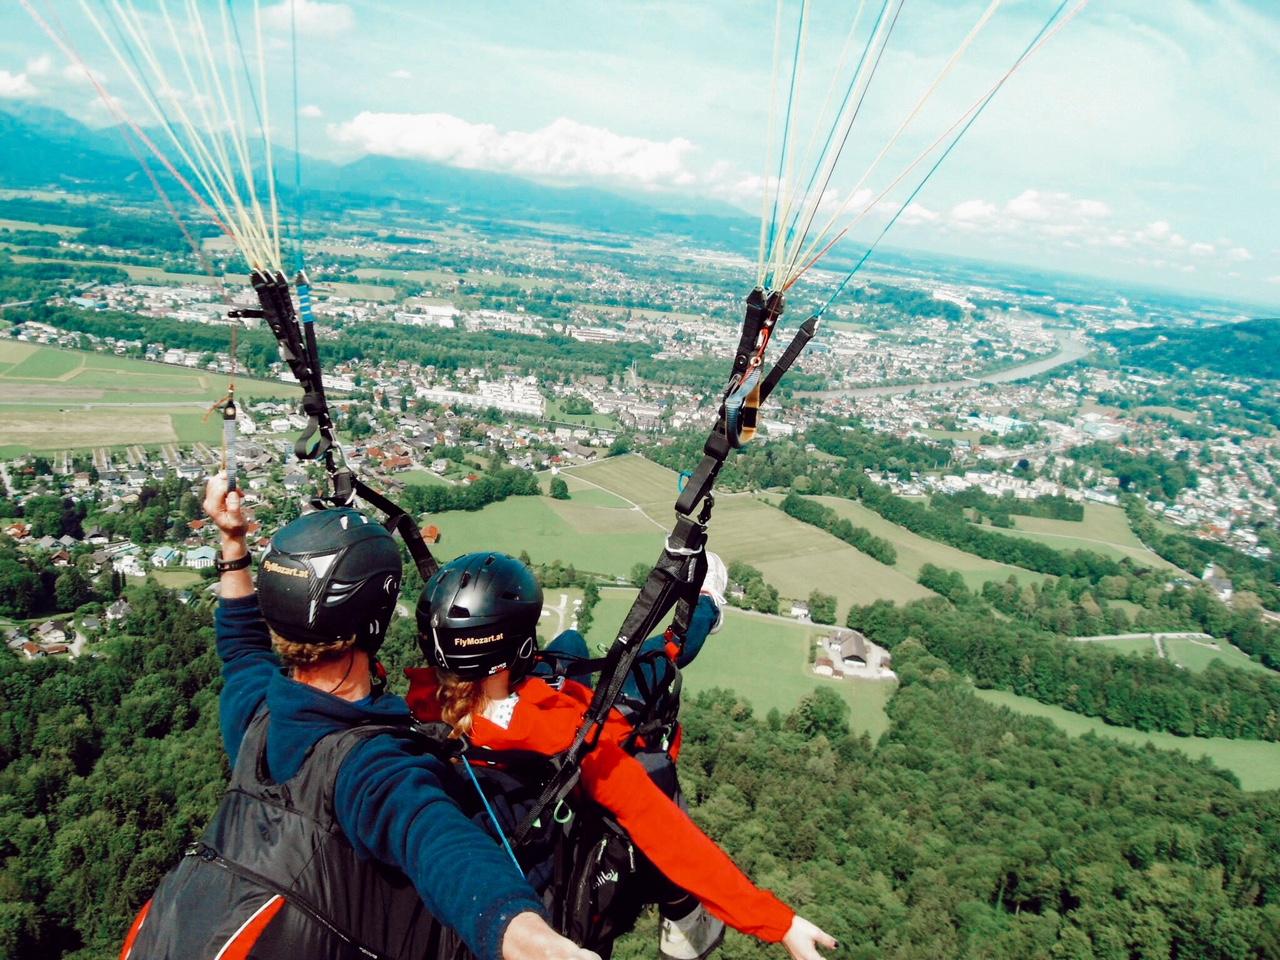 Paragliding in Austria on my 20th birthday!